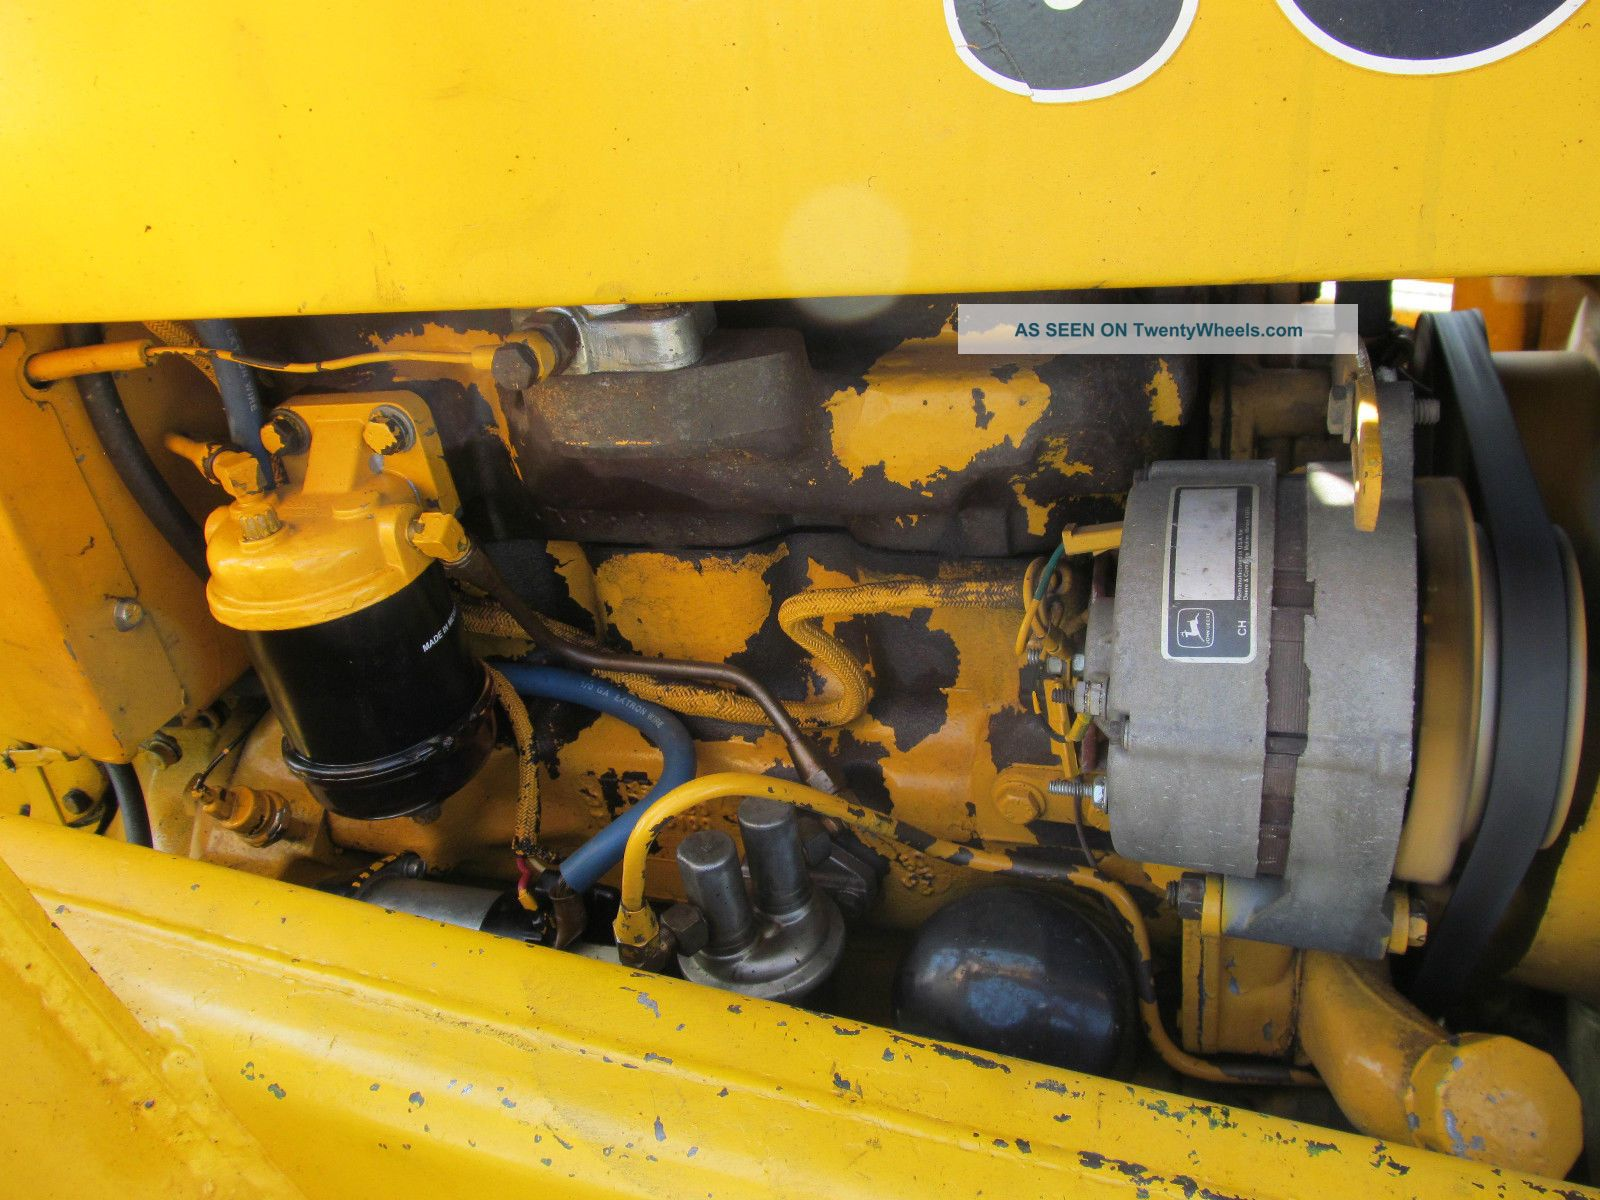 John Deere 301 A Industrial Tractor Loader 43 Hp Diesel Gear Hydro  #BE9B0D